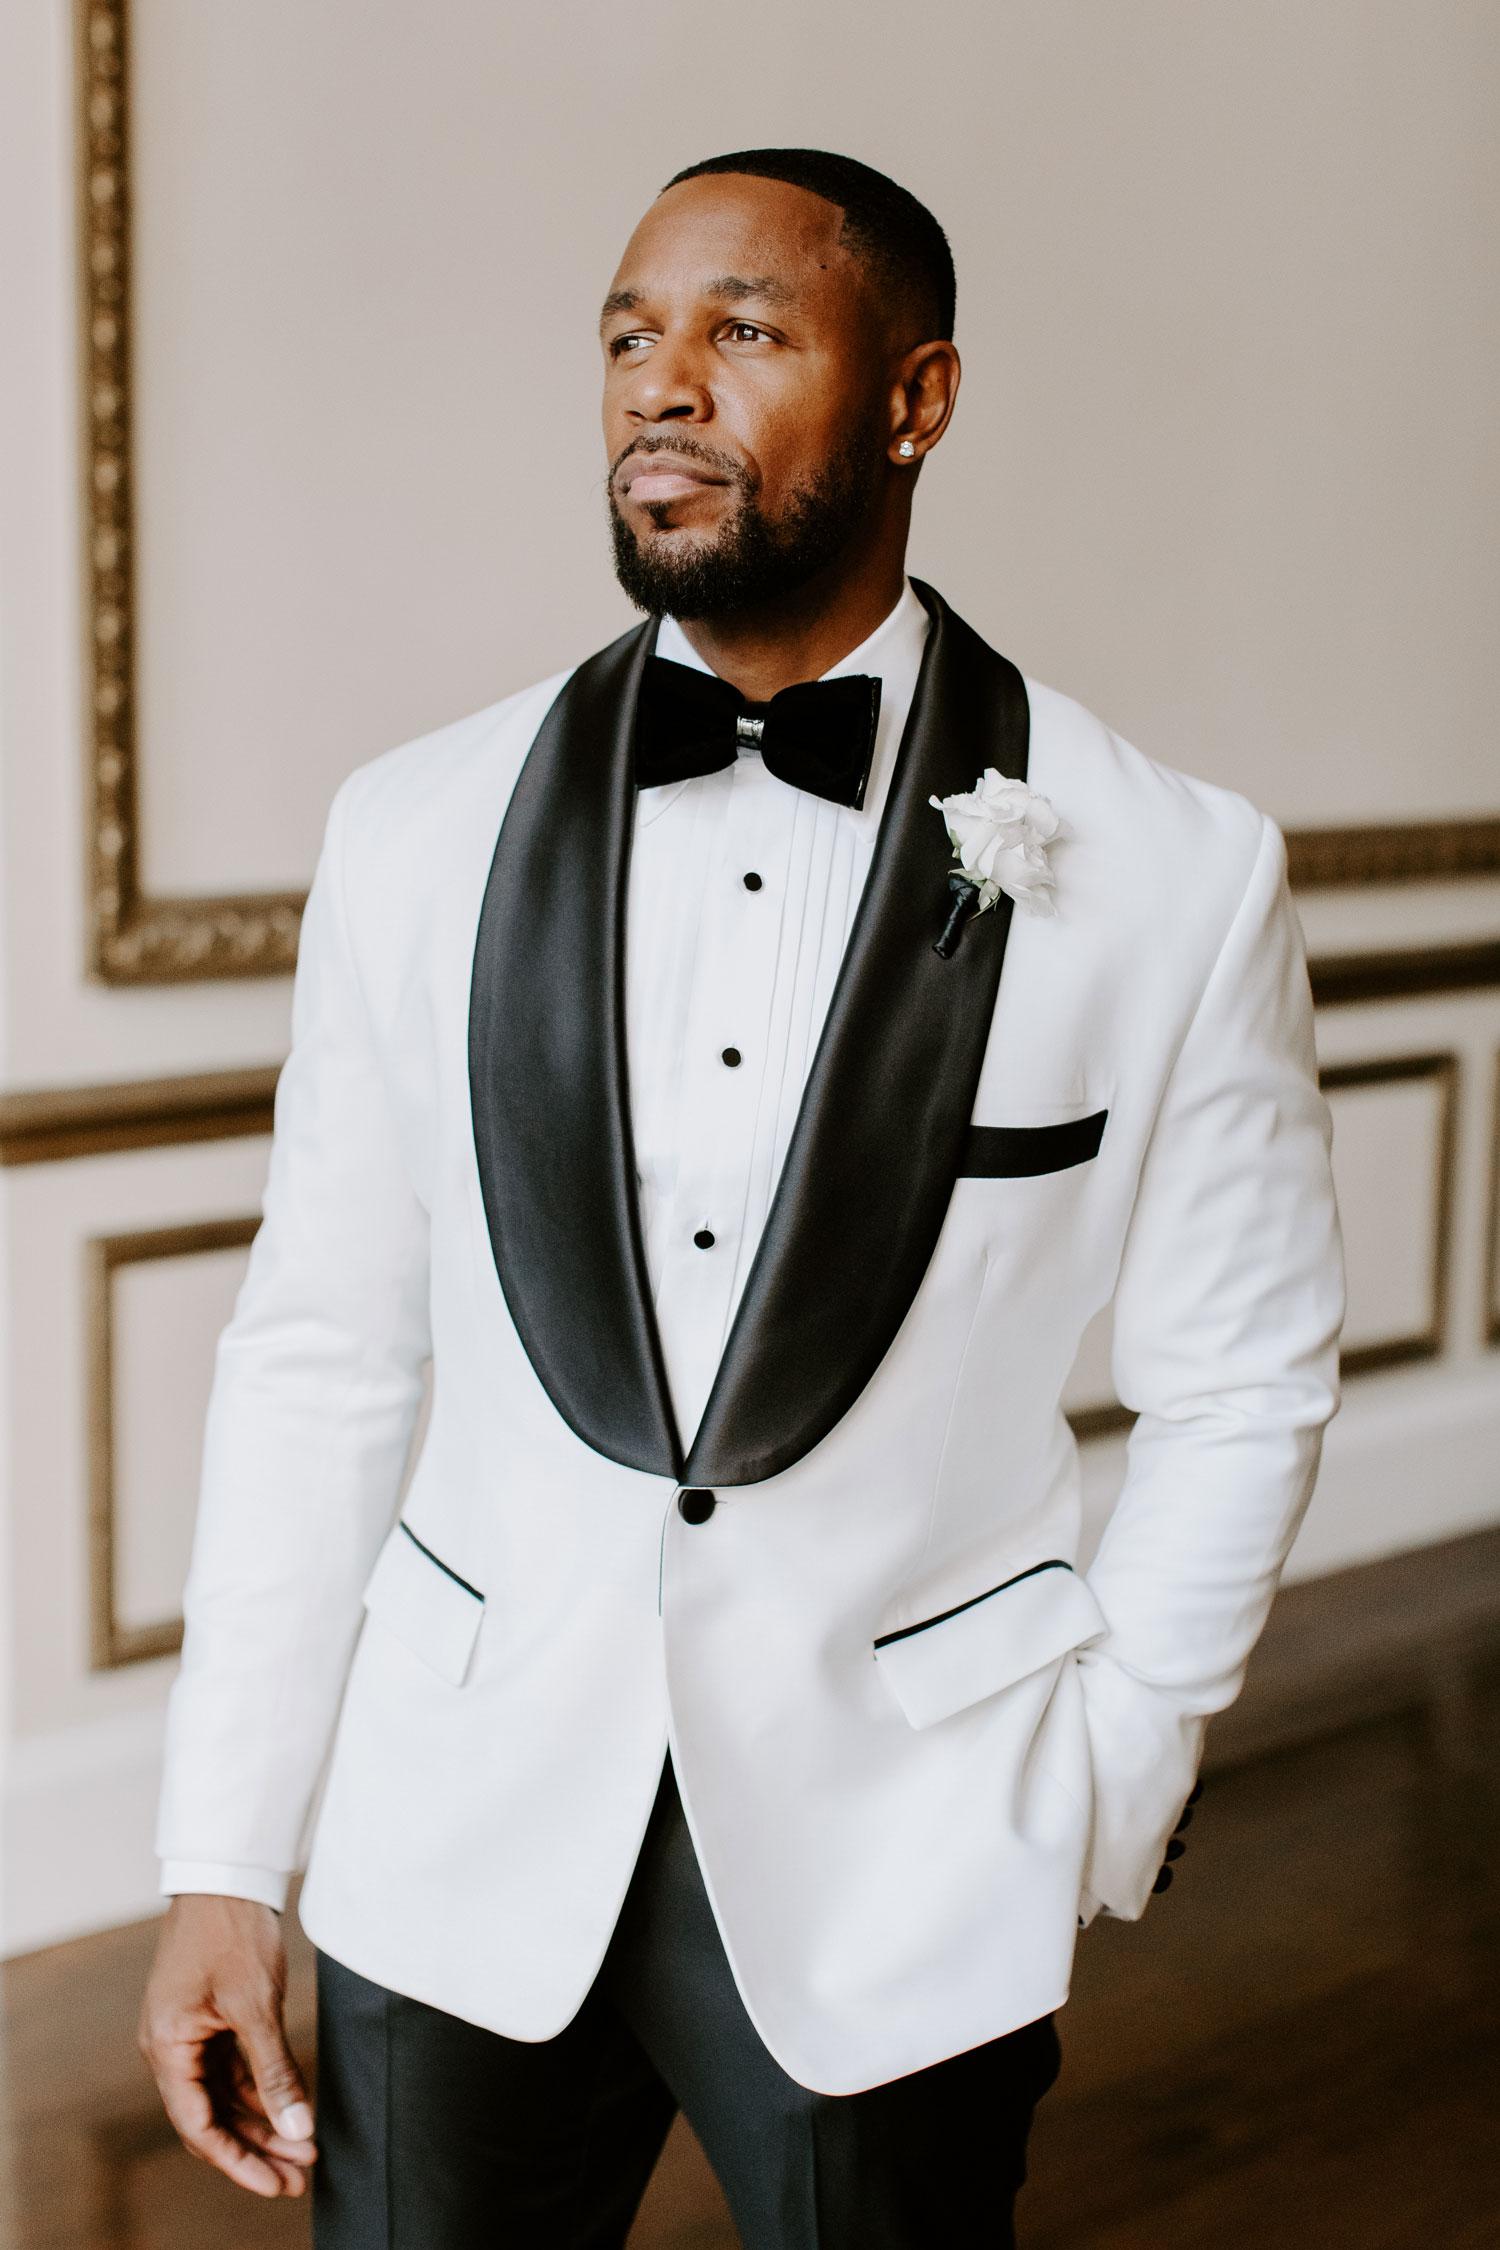 fd285cf0d4ec2 durrell tank babbs wedding attire white tuxedo jacket with black lapels  jamie foxx groomsman groom style